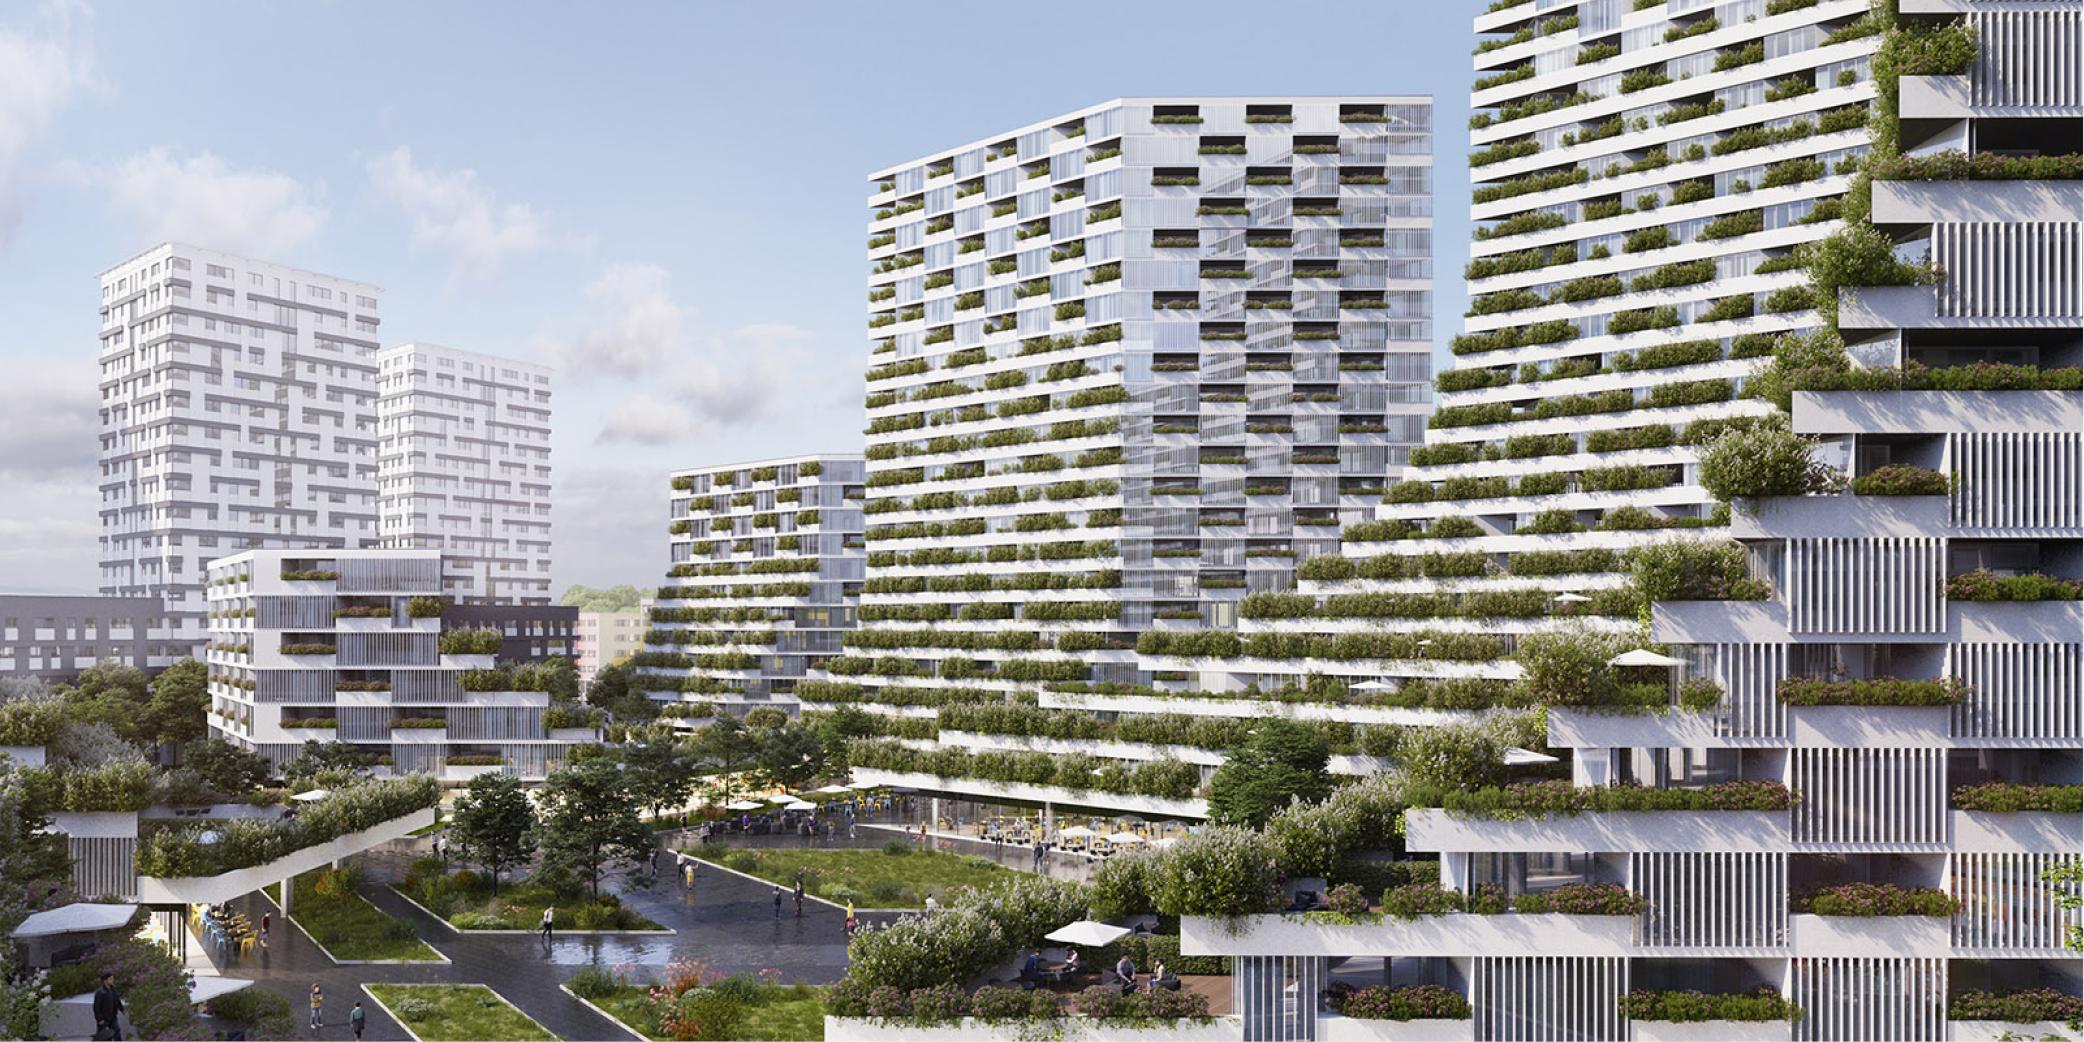 OCA-architects-Barcelona-Prague-House-of-Arboretum-residential-housing-project-Hernan-Lleida-Ruiz-Bernardo-Garcia-Morales-1